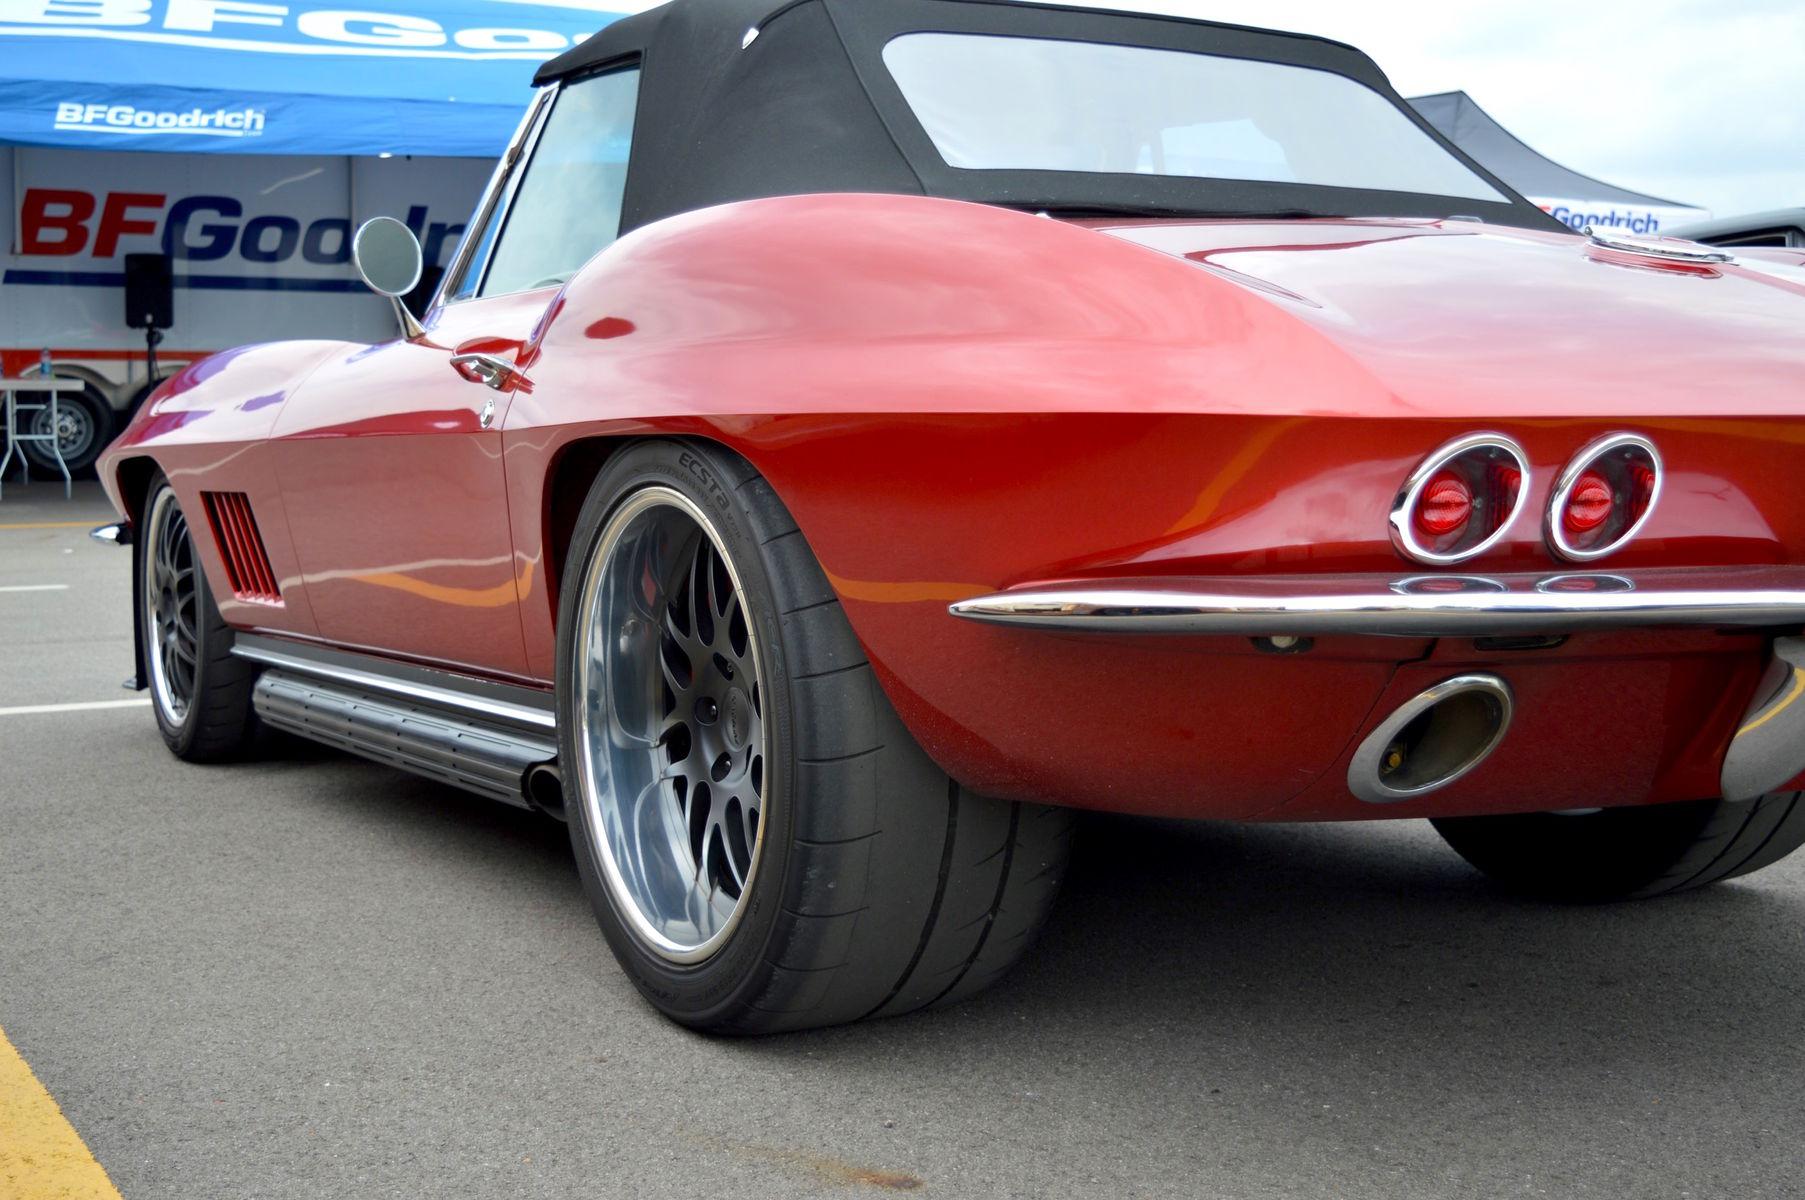 1967 Chevrolet Corvette | Nick Weber's 1967 Corvette Convertible on Forgeline DE3P Wheels